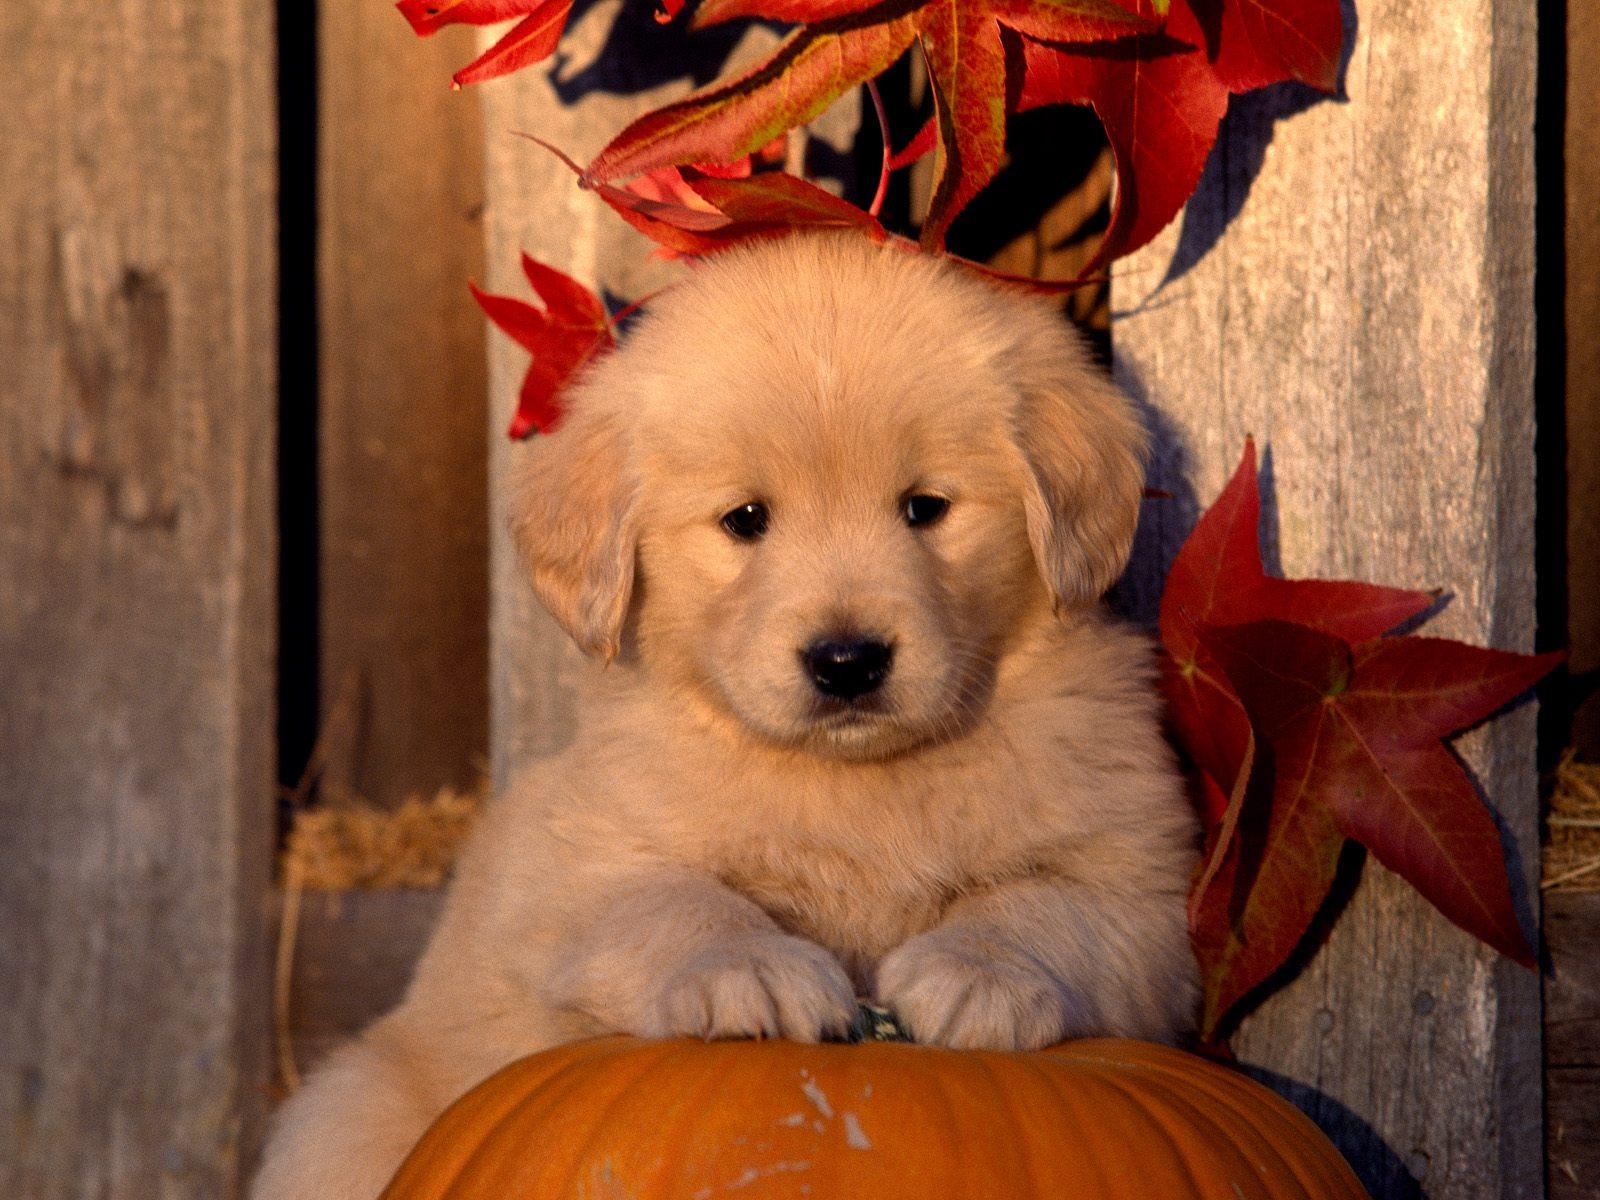 Autumn Golden Retriever puppy photo and wallpaper Beautiful Autumn 1600x1200